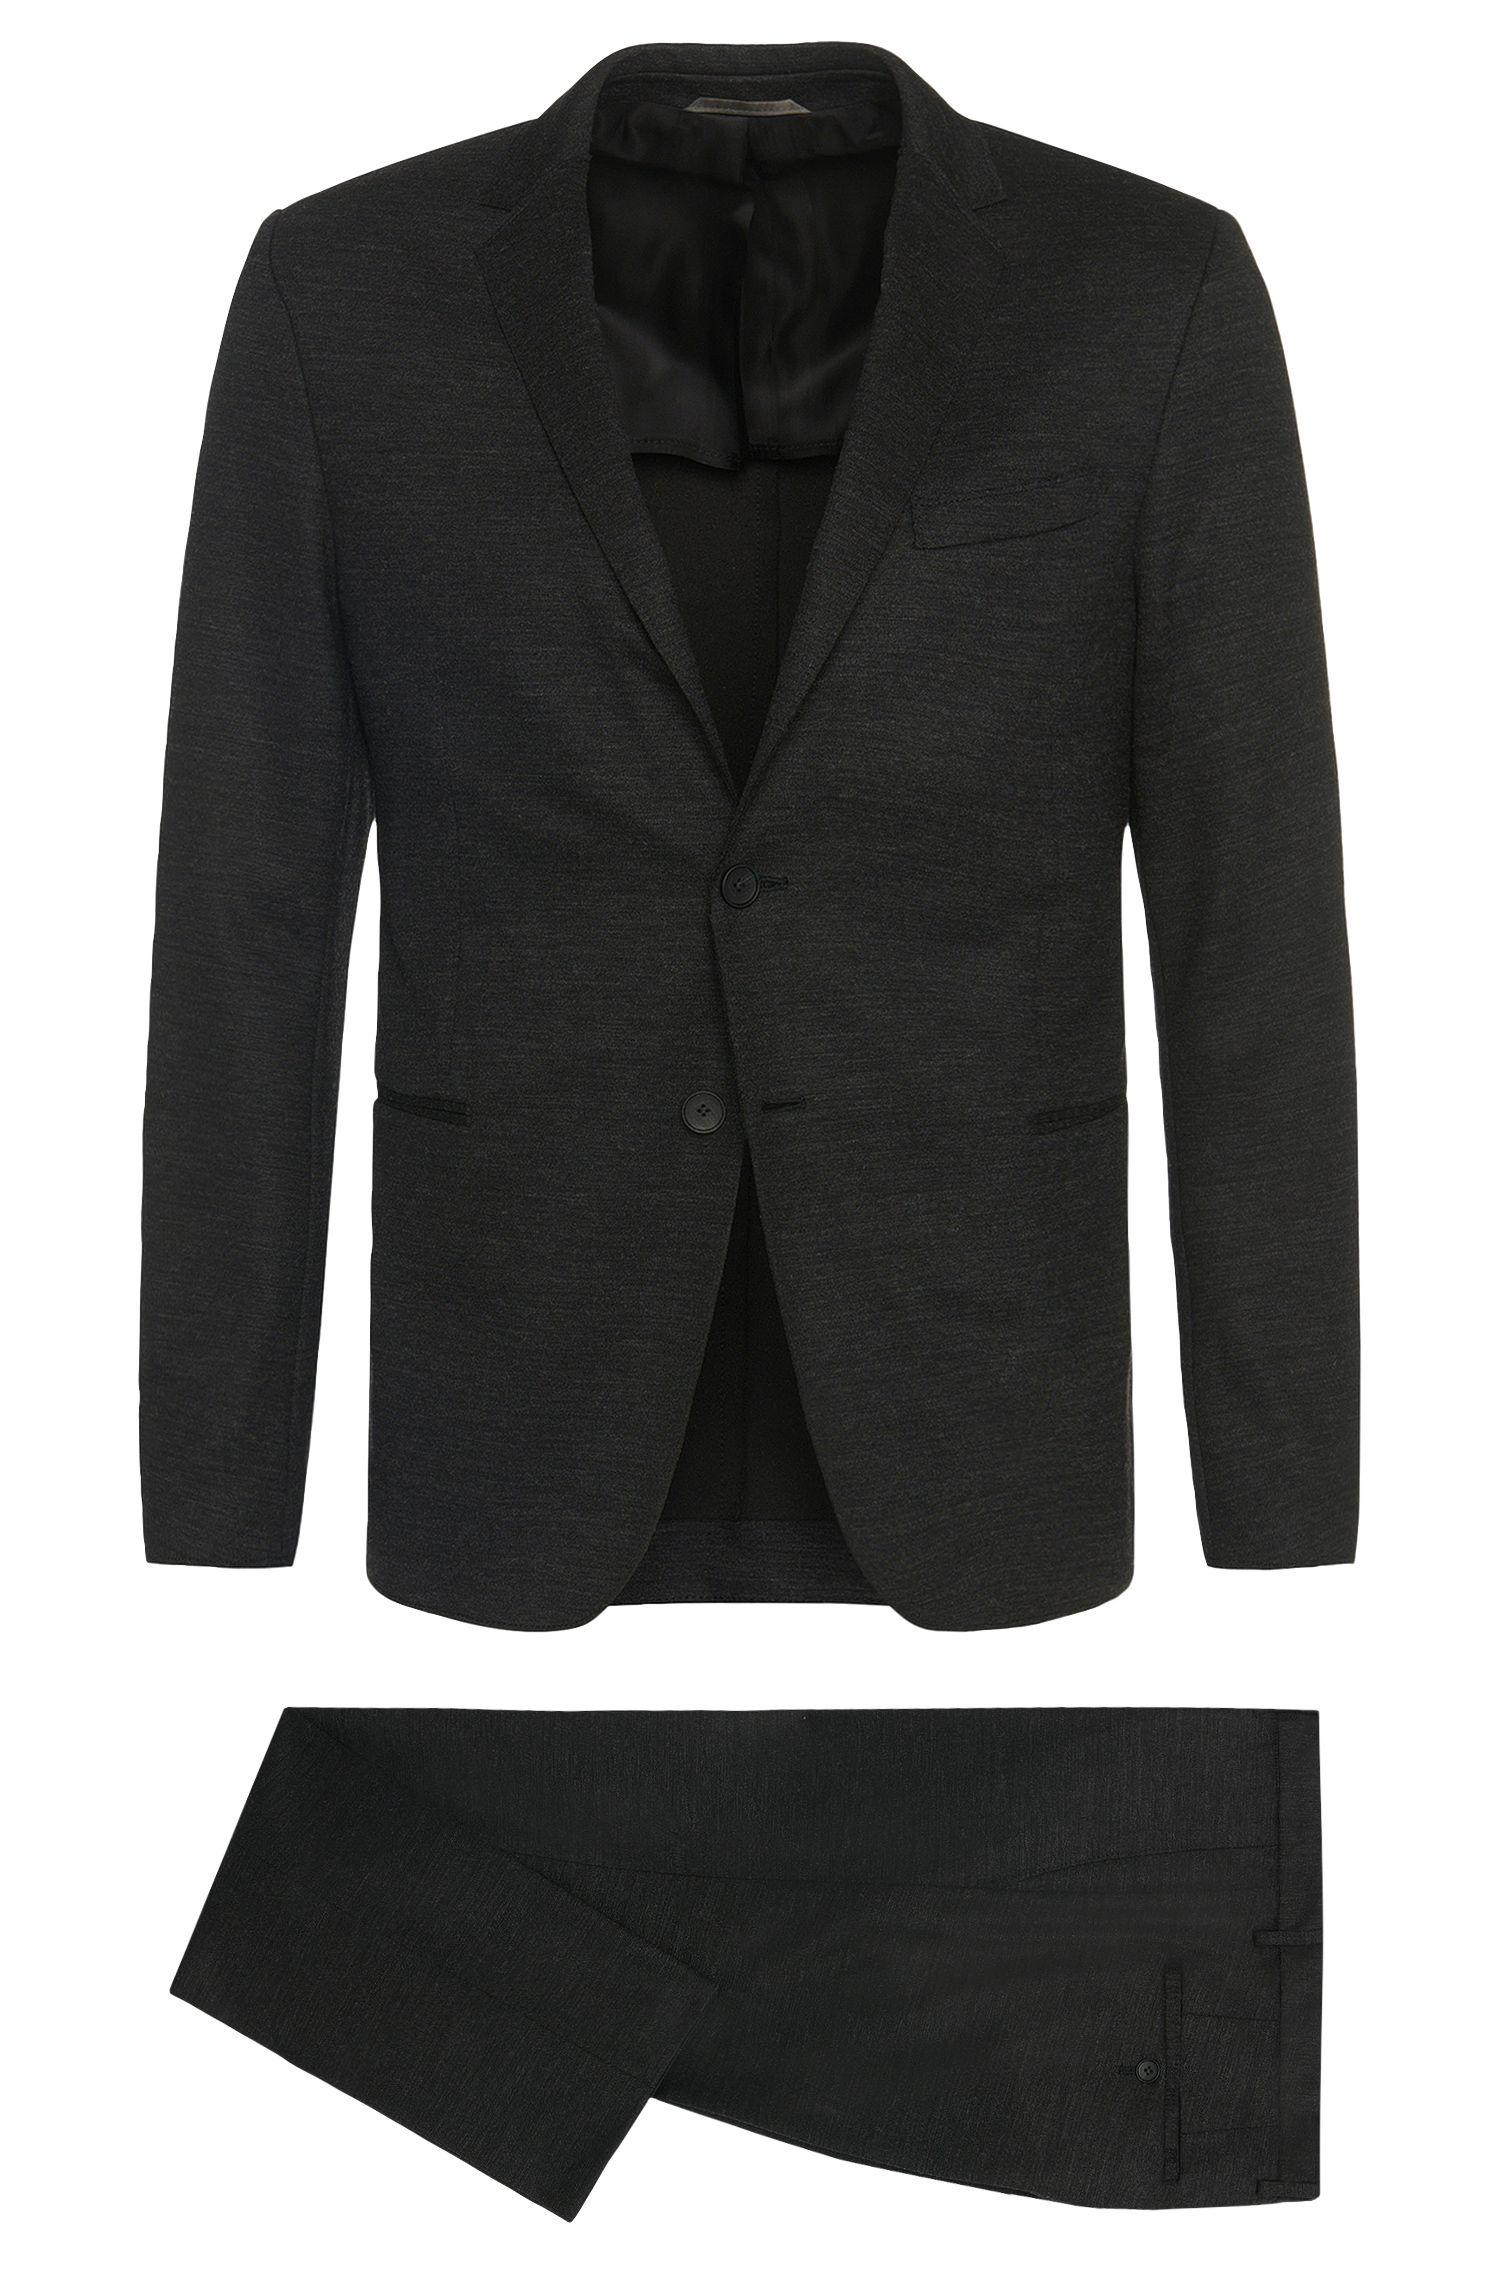 'Natan/Bruce'   Slim Fit, Stretch Virgin Wool Blend Jersey Suit